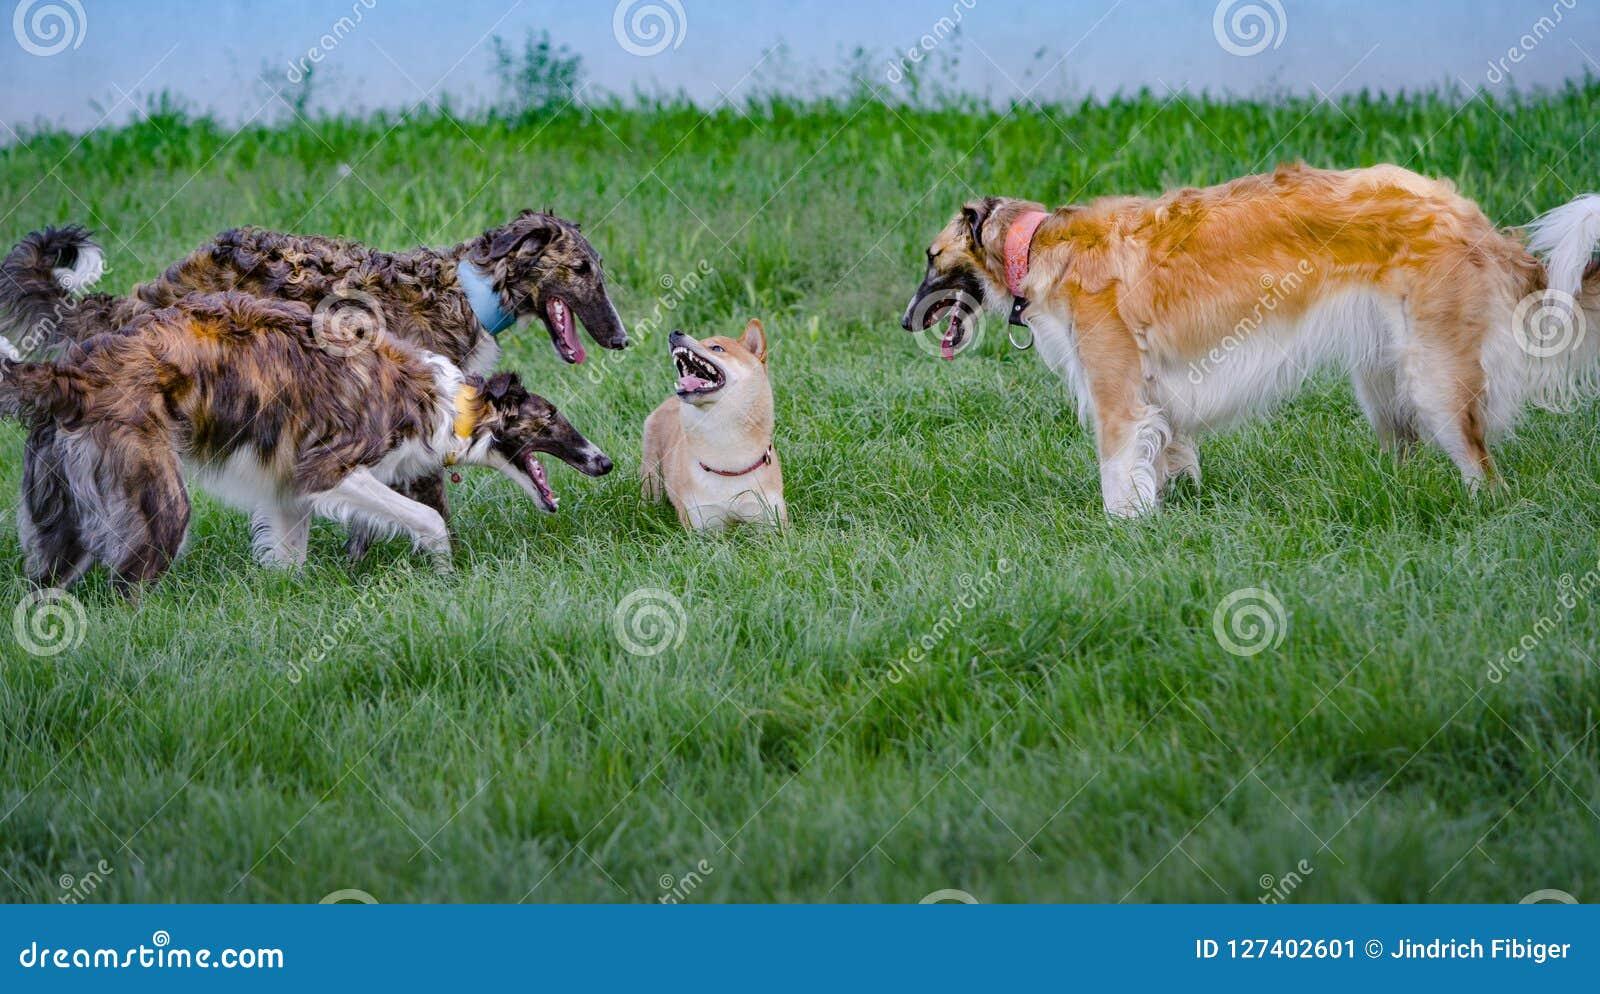 Borzois Is Hunting Shiba Inu I Stock Image Image Of White Dogs